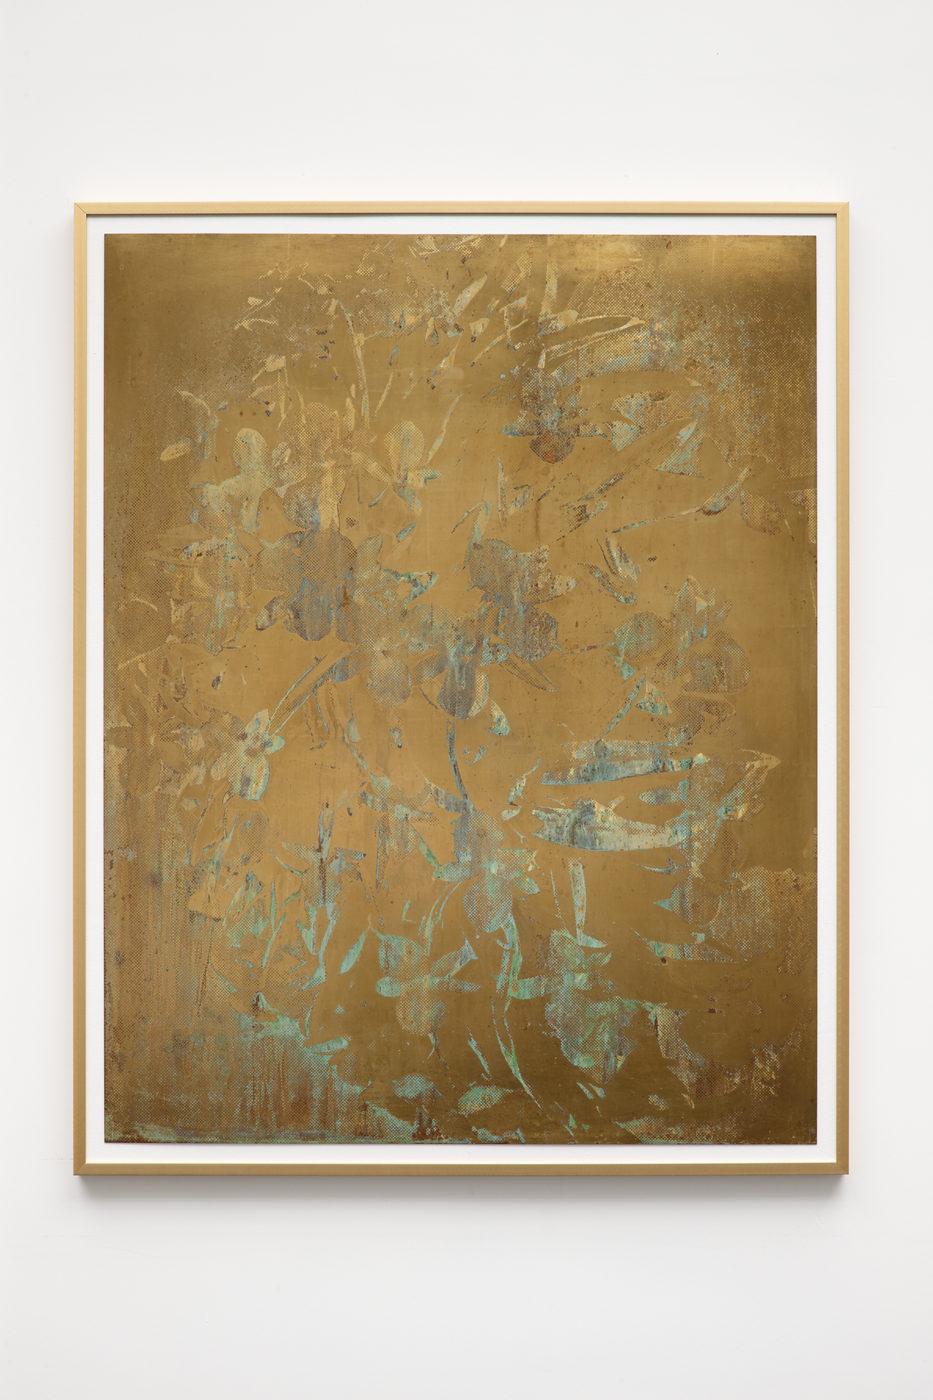 Ross Iannatti - E.C.E no. 46, 2016